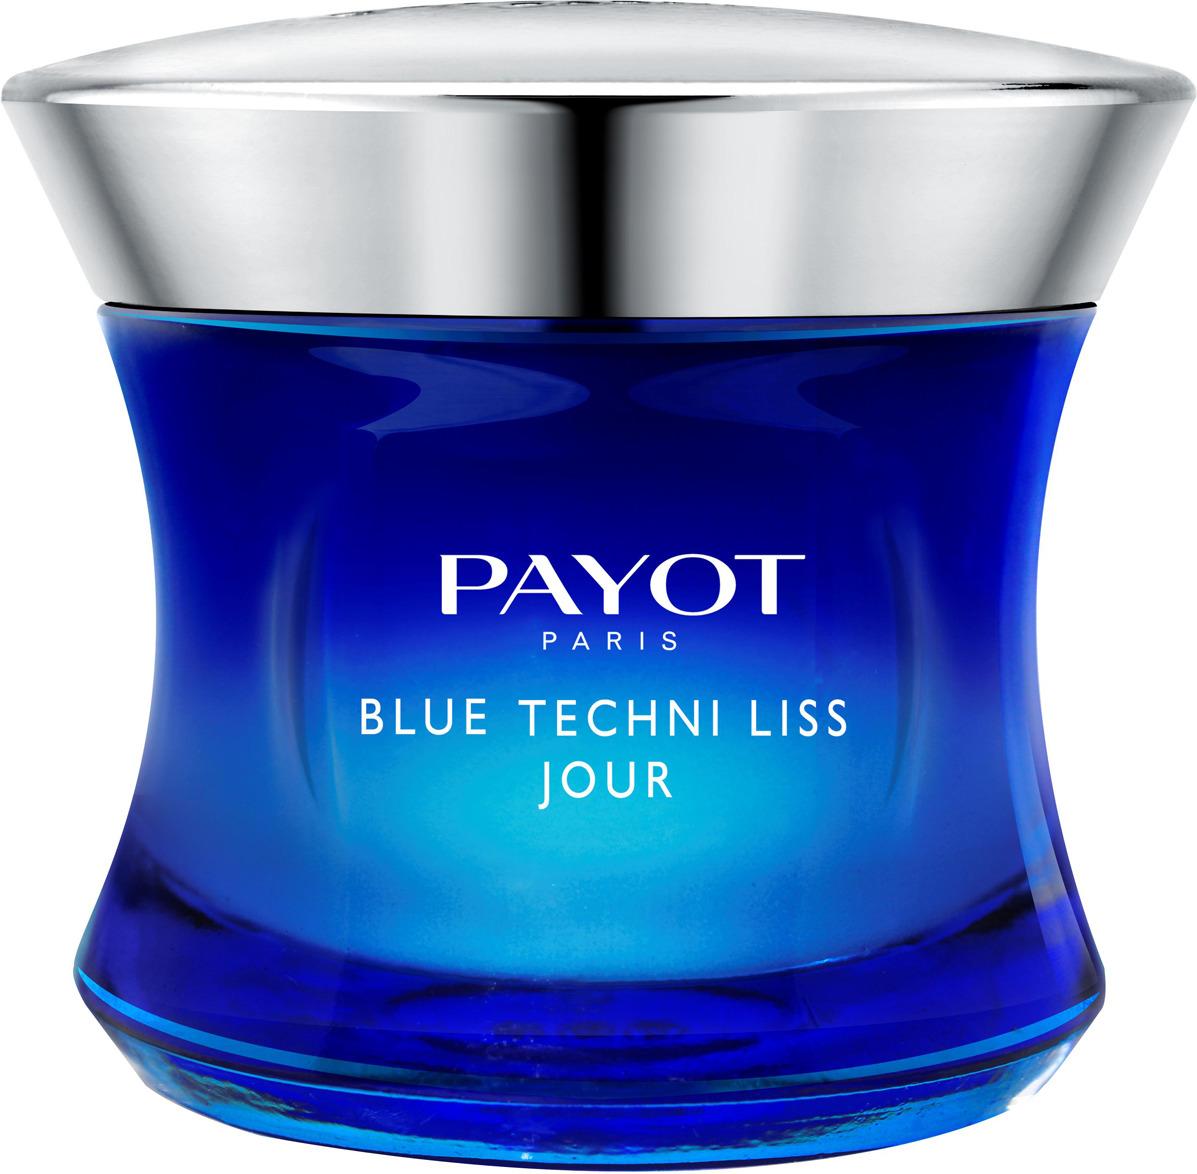 Крем для ухода за кожей Payot Blue Techni Liss, хроноактивный дневной крем, 50 мл дневной хроноактивный крем payot blue techni liss 50 мл